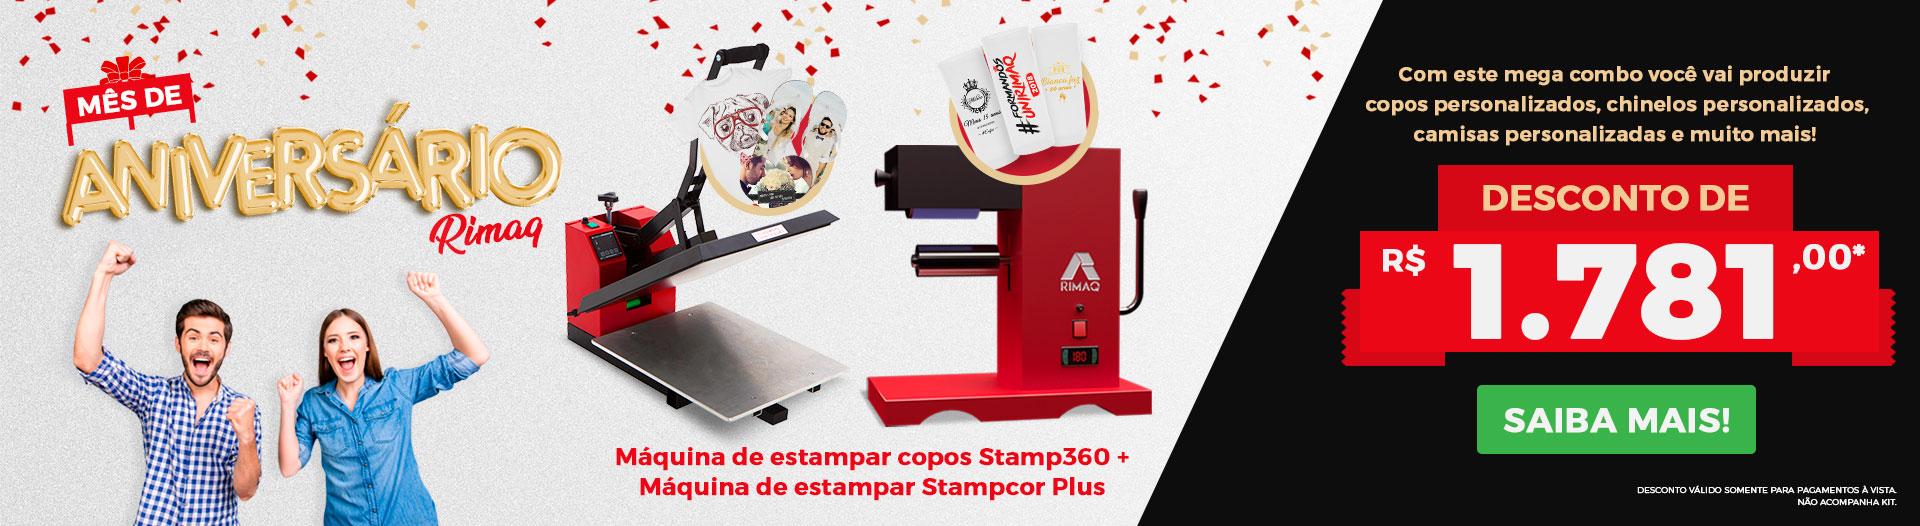 banner-site-aniversario-chinelos-stampcor=plus